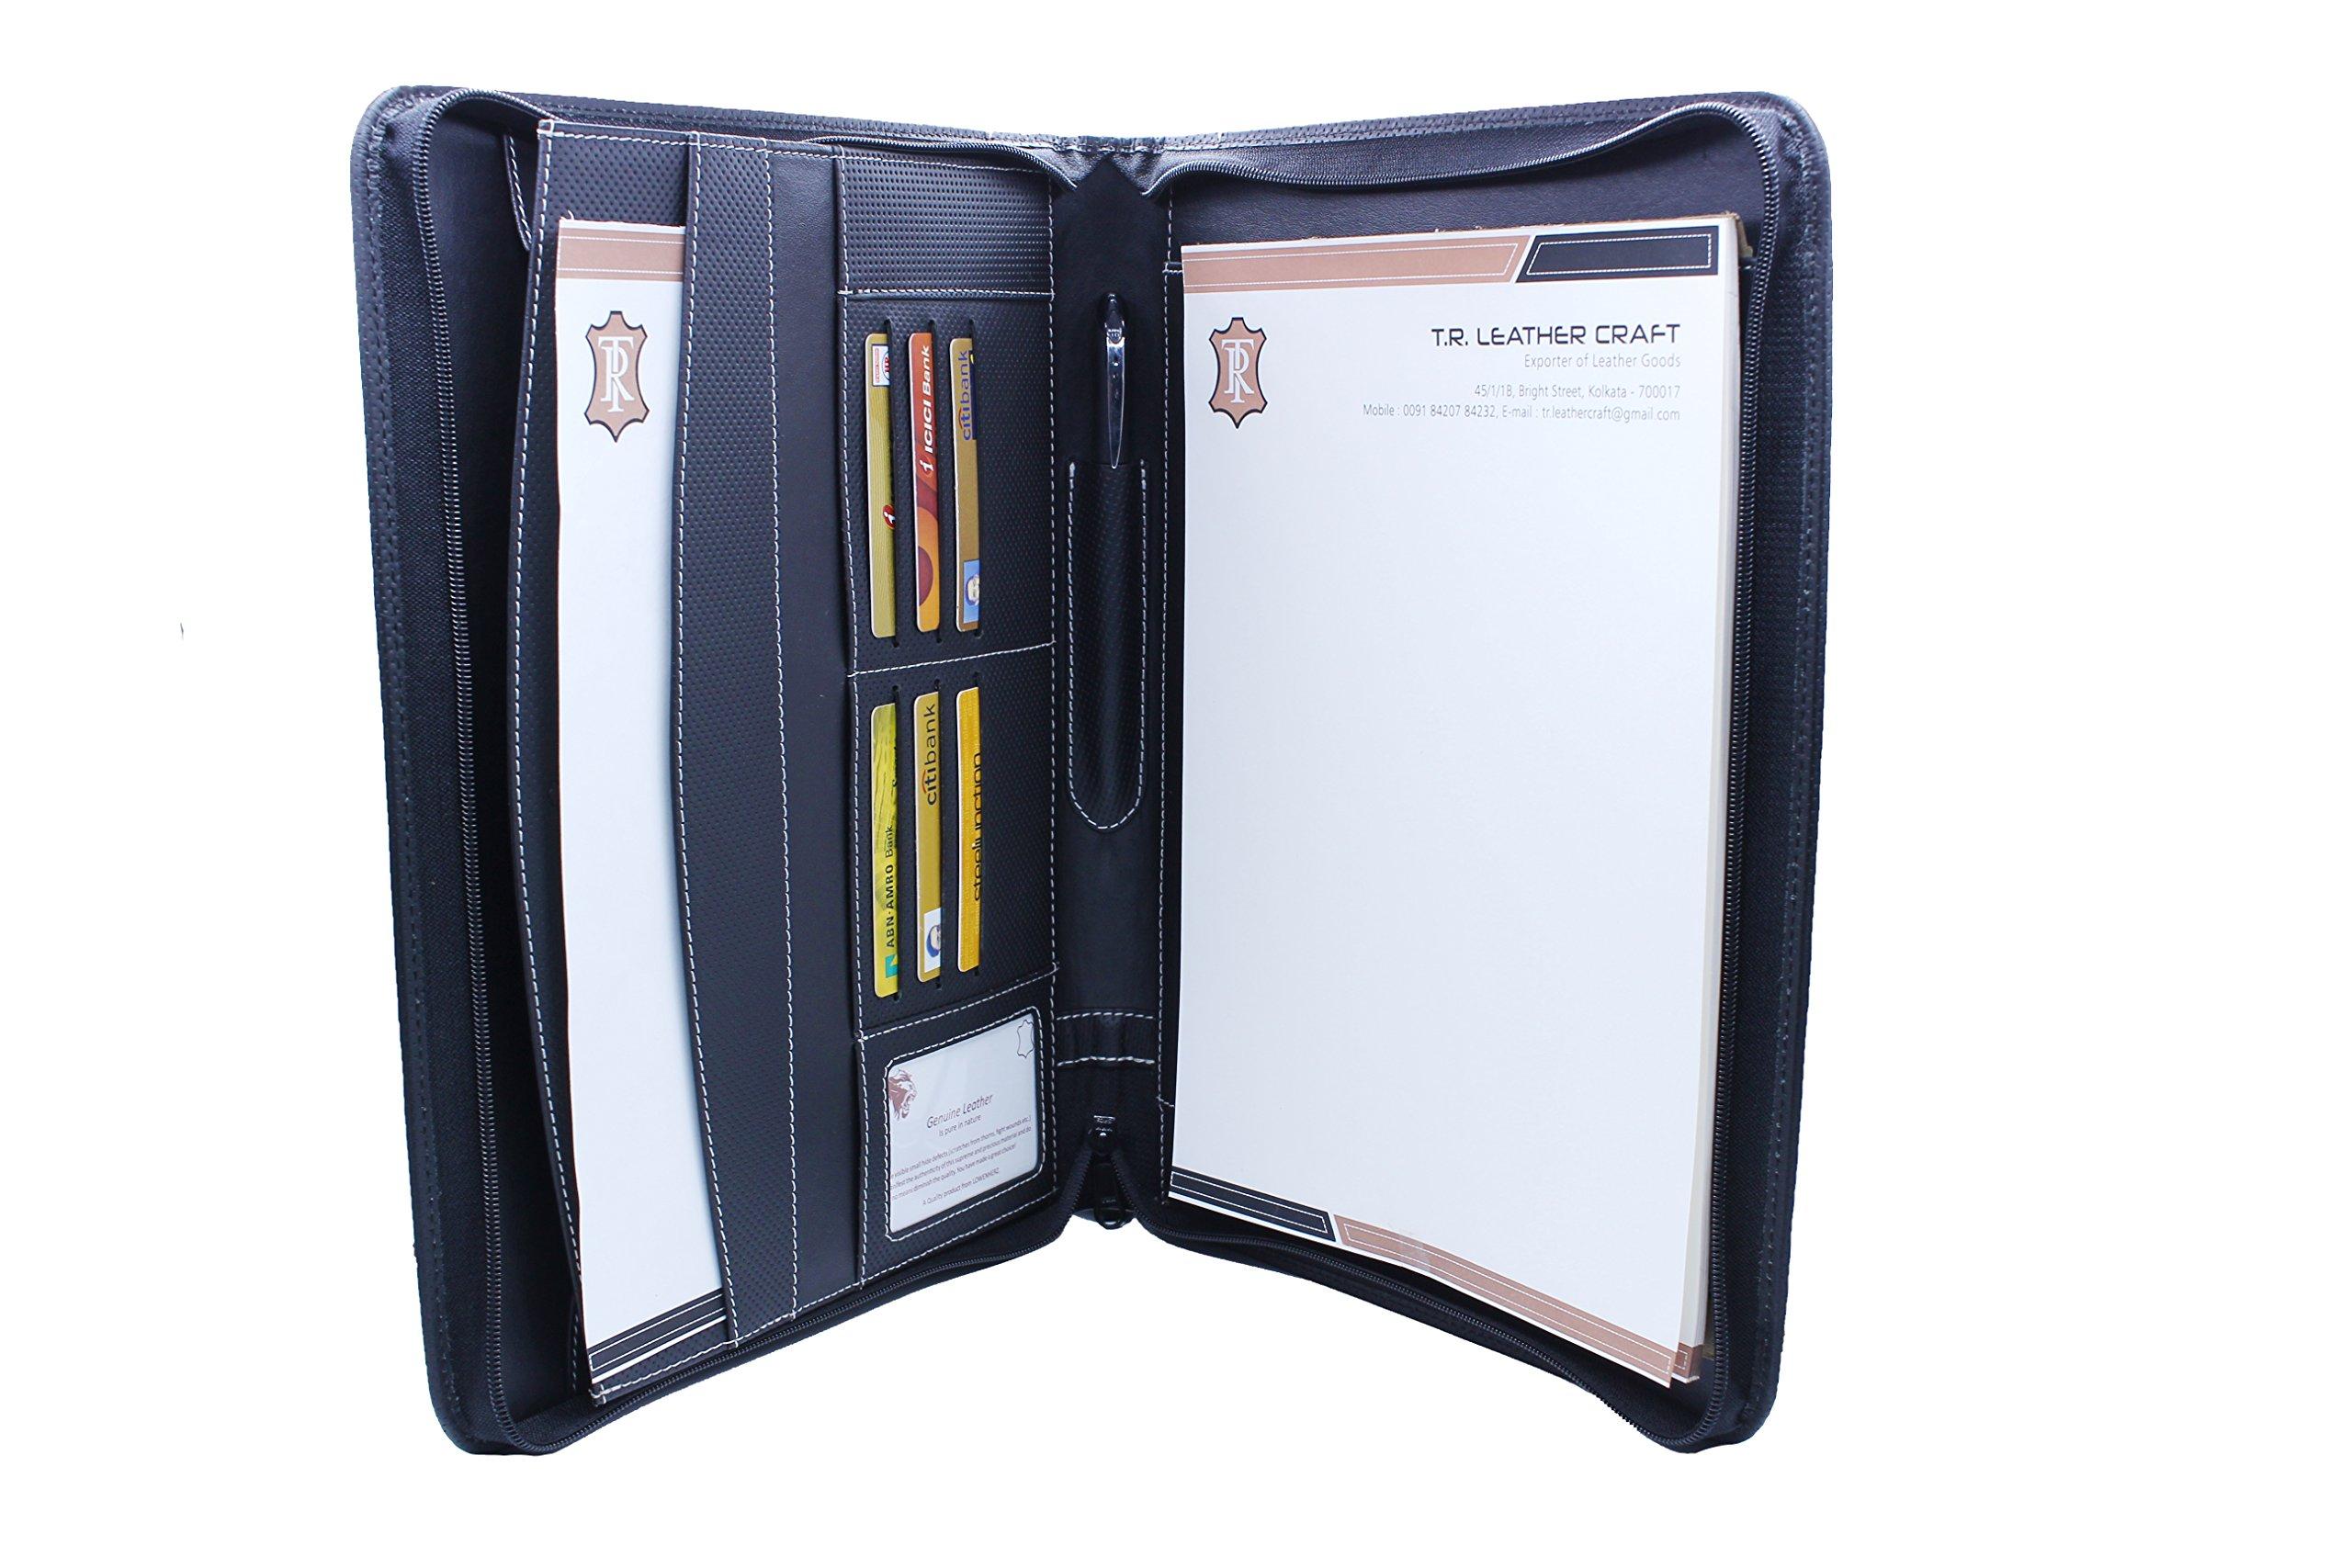 Premium Genuine Leather RFID Blocking Business Portfolio/Professional Organizer with Zipper Black by Lowenherz (14.25 x 10.75 x 1.15, Samsonite Black)